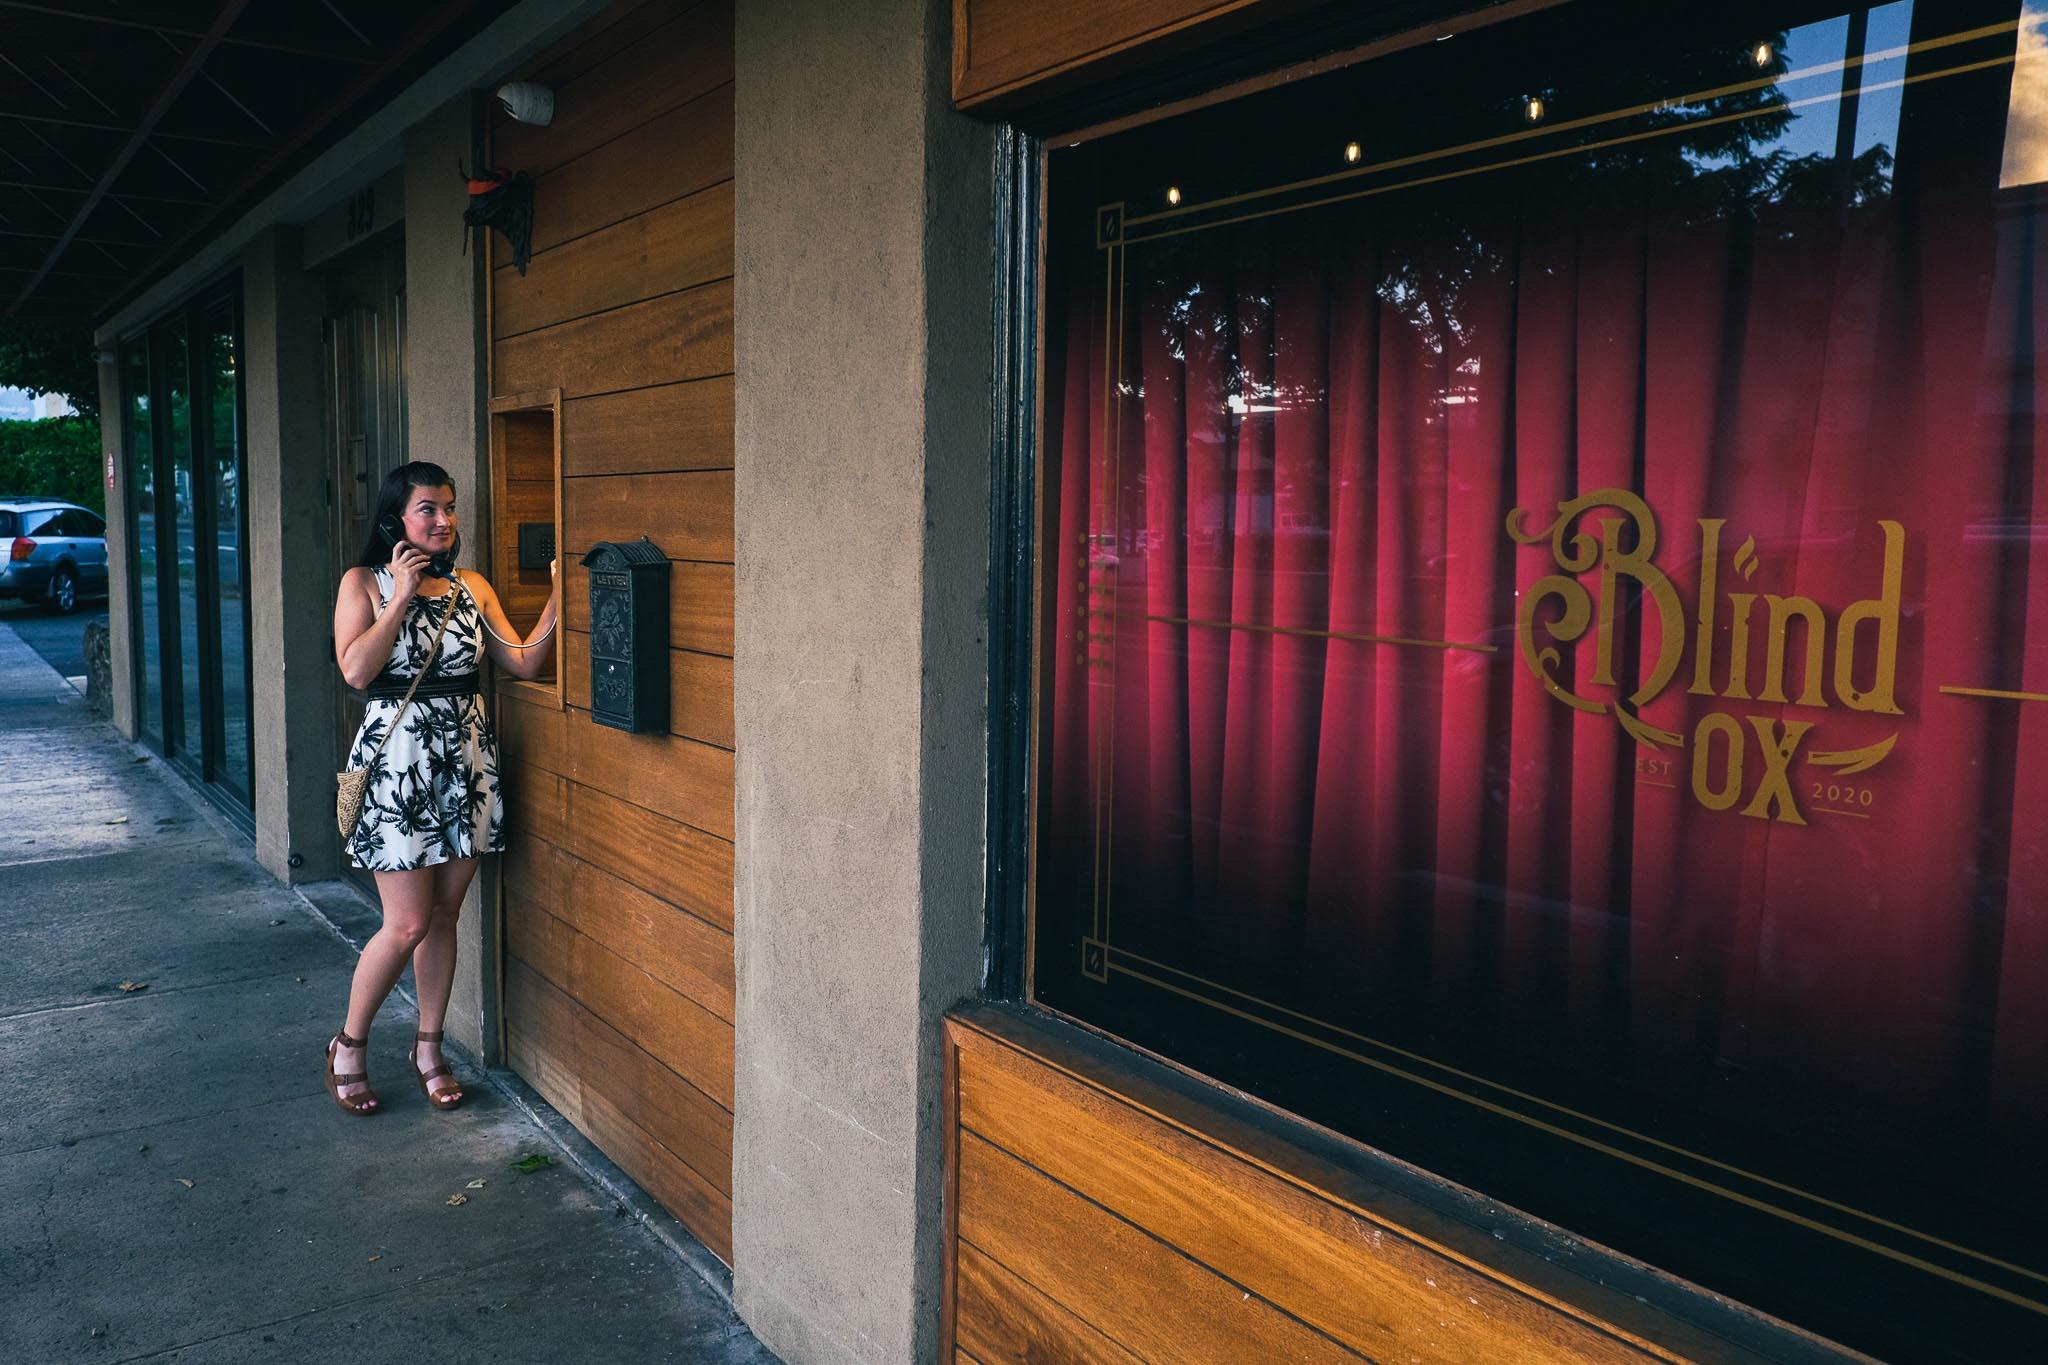 The Entrance of Blind Ox Honolulu Speakeasy